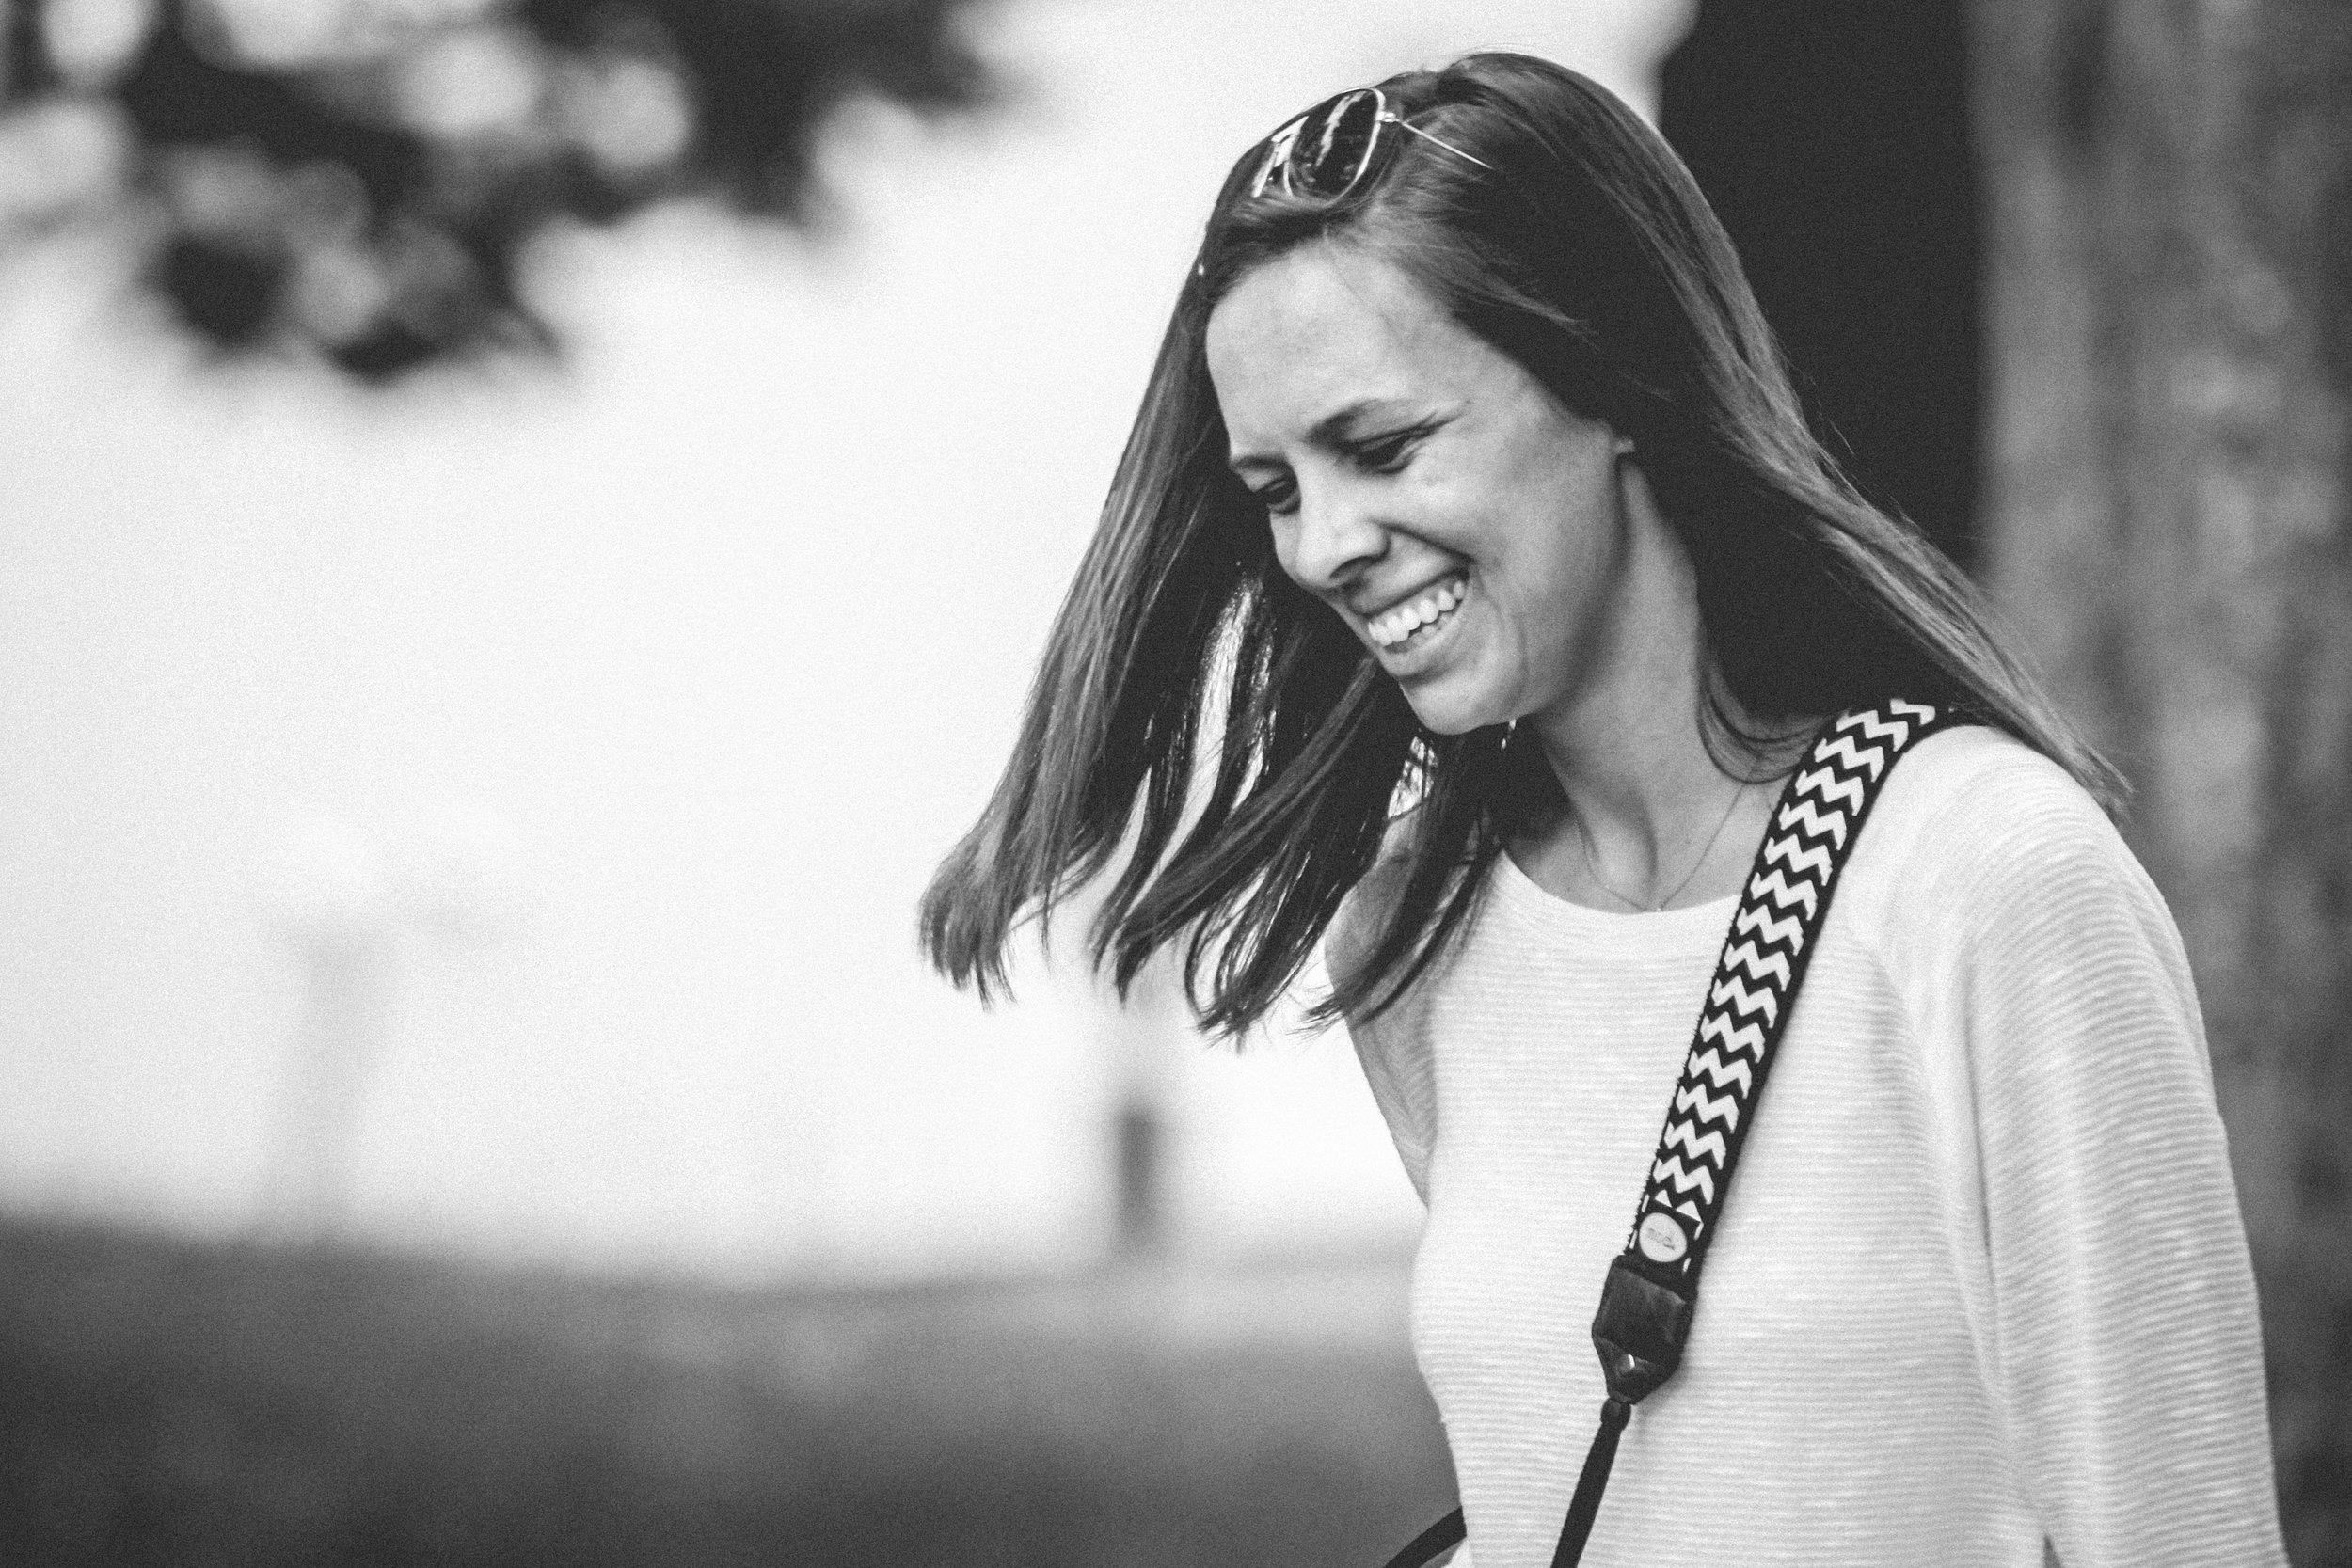 Becky Rothrauff, Principal Photographer